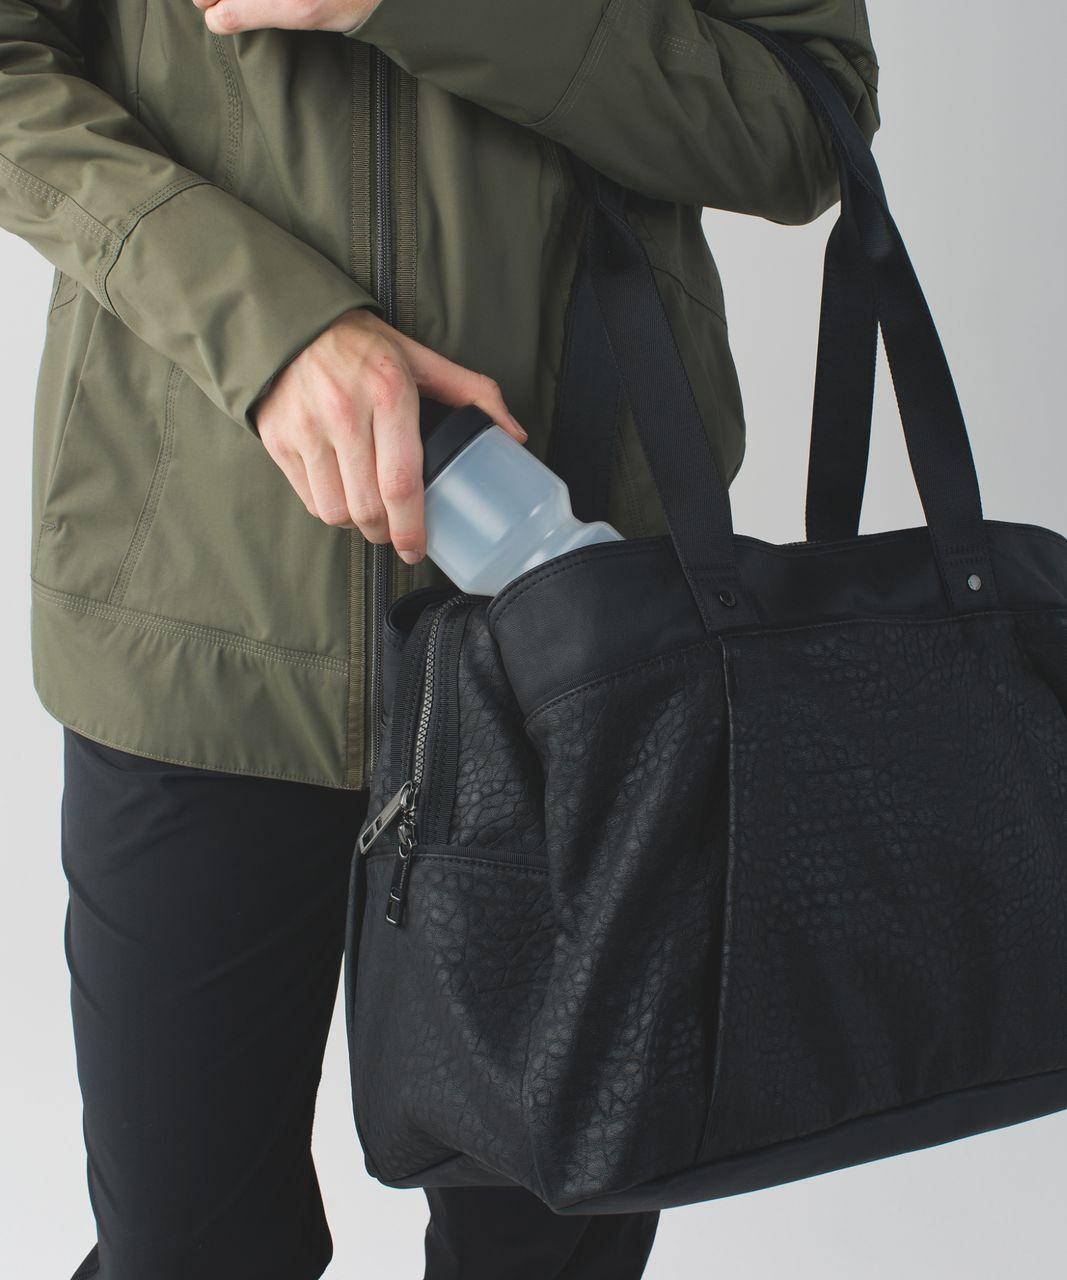 10852eccf2 How To Wash Lululemon Gym Bag